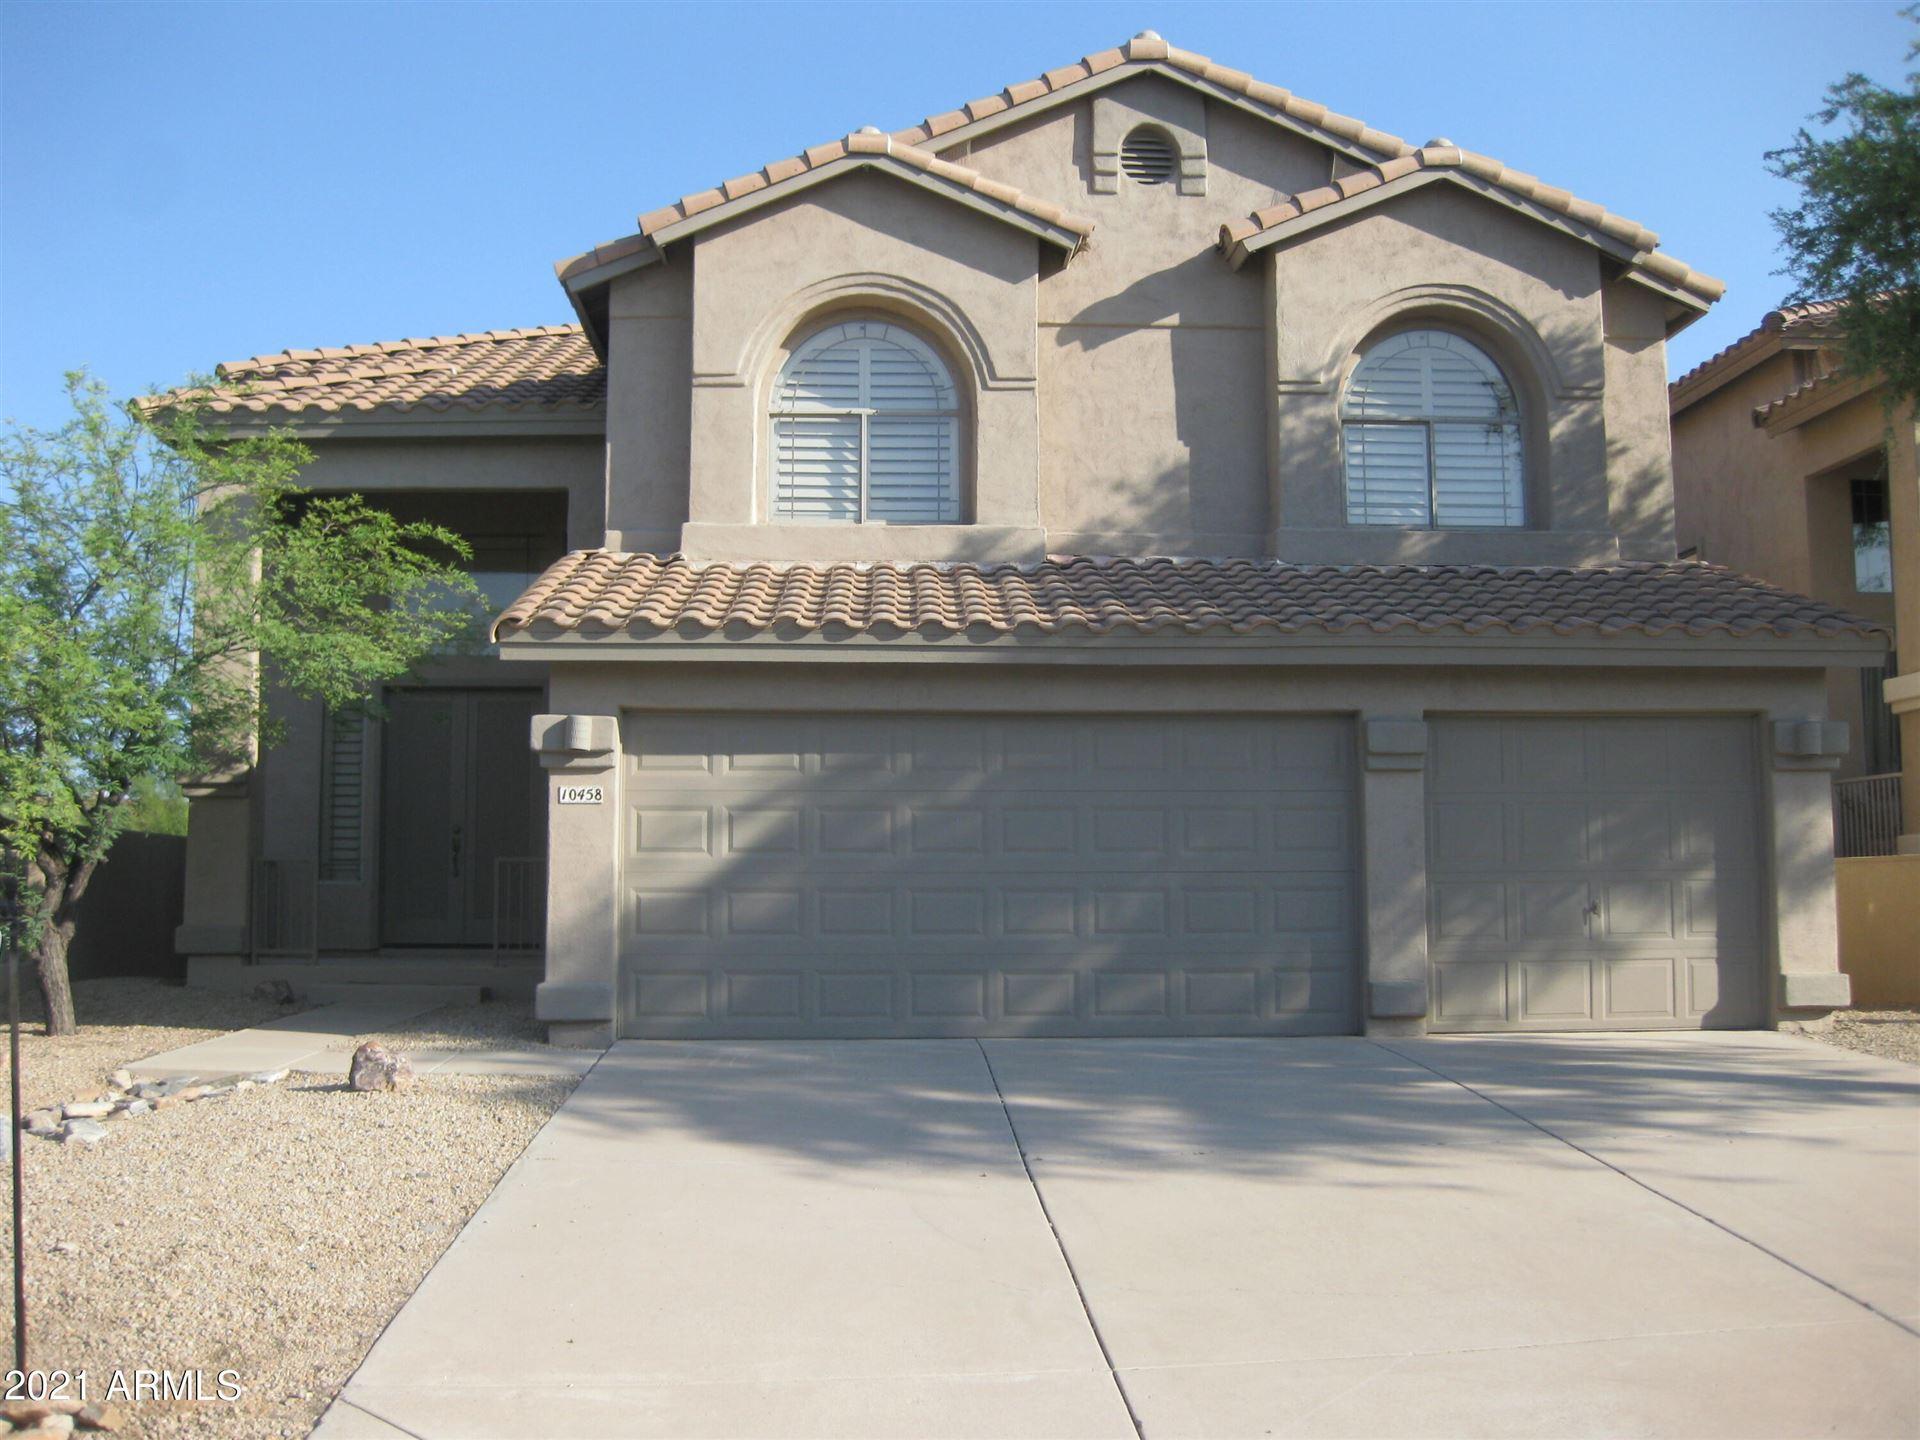 10458 E MORNING STAR Drive, Scottsdale, AZ 85255 - MLS#: 6270271